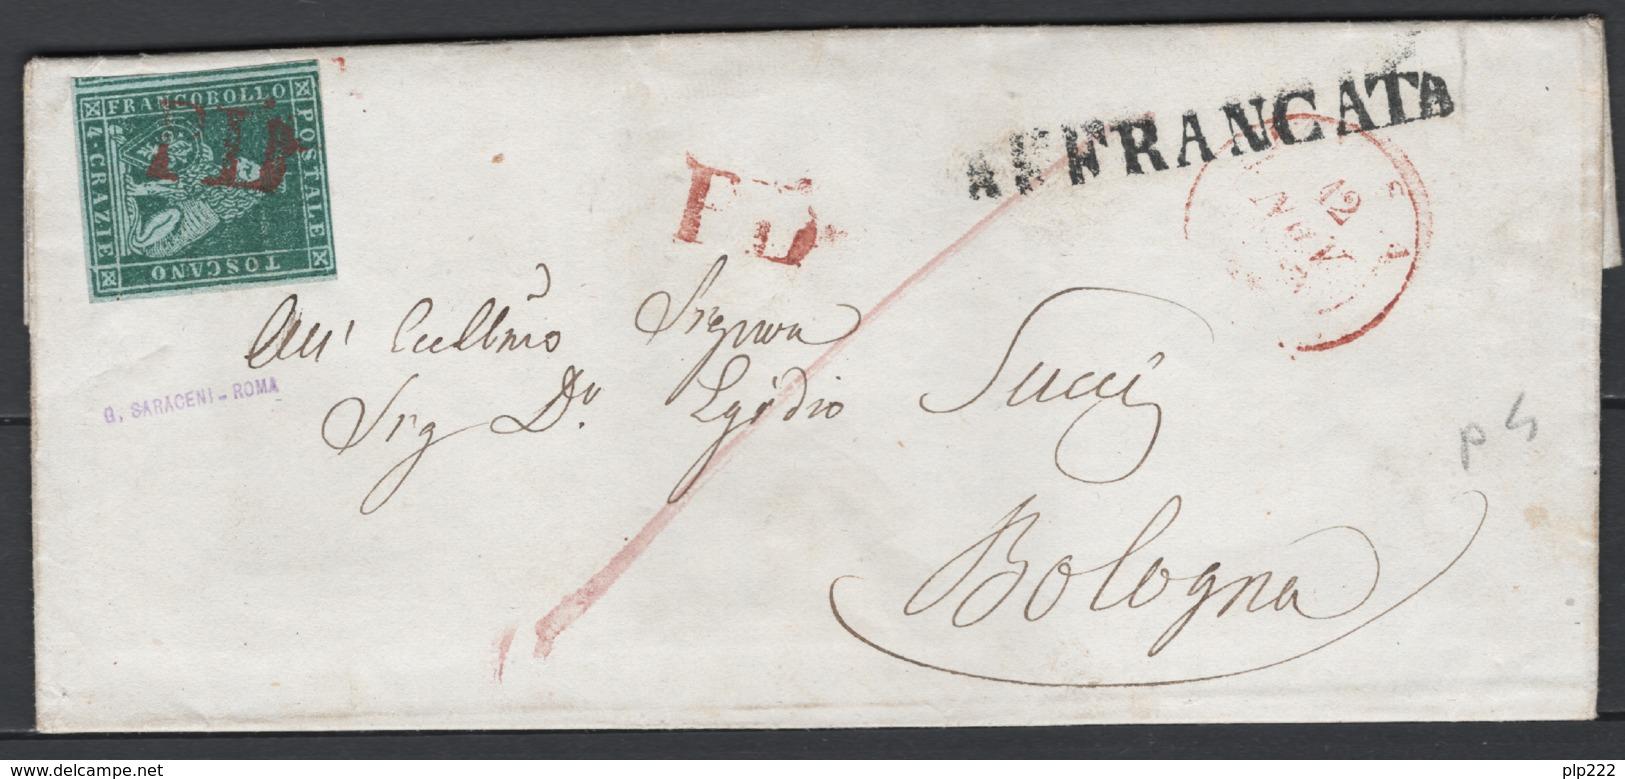 Toscana 1851 4cr. Su Lettera Da Pisa A Bologna 12/11/53 Sass.6a O/Used VF/F - Tuscany